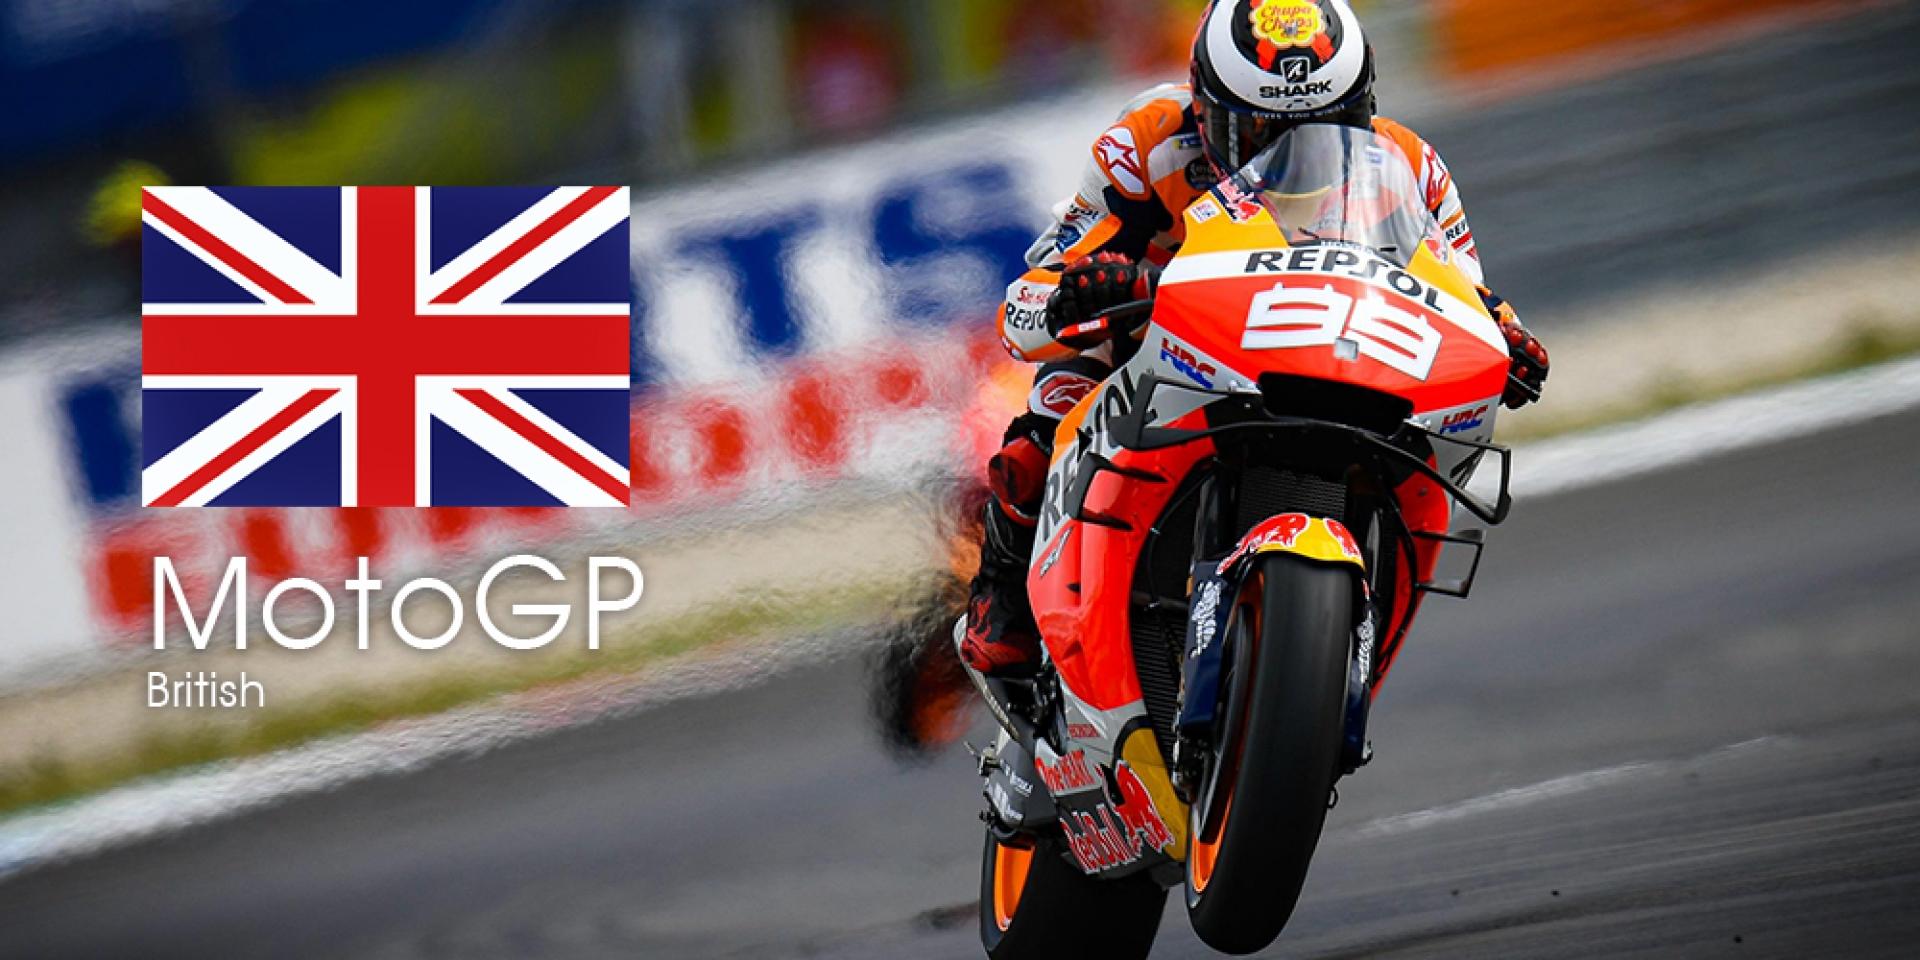 MotoGP 2019 英國站 轉播時間